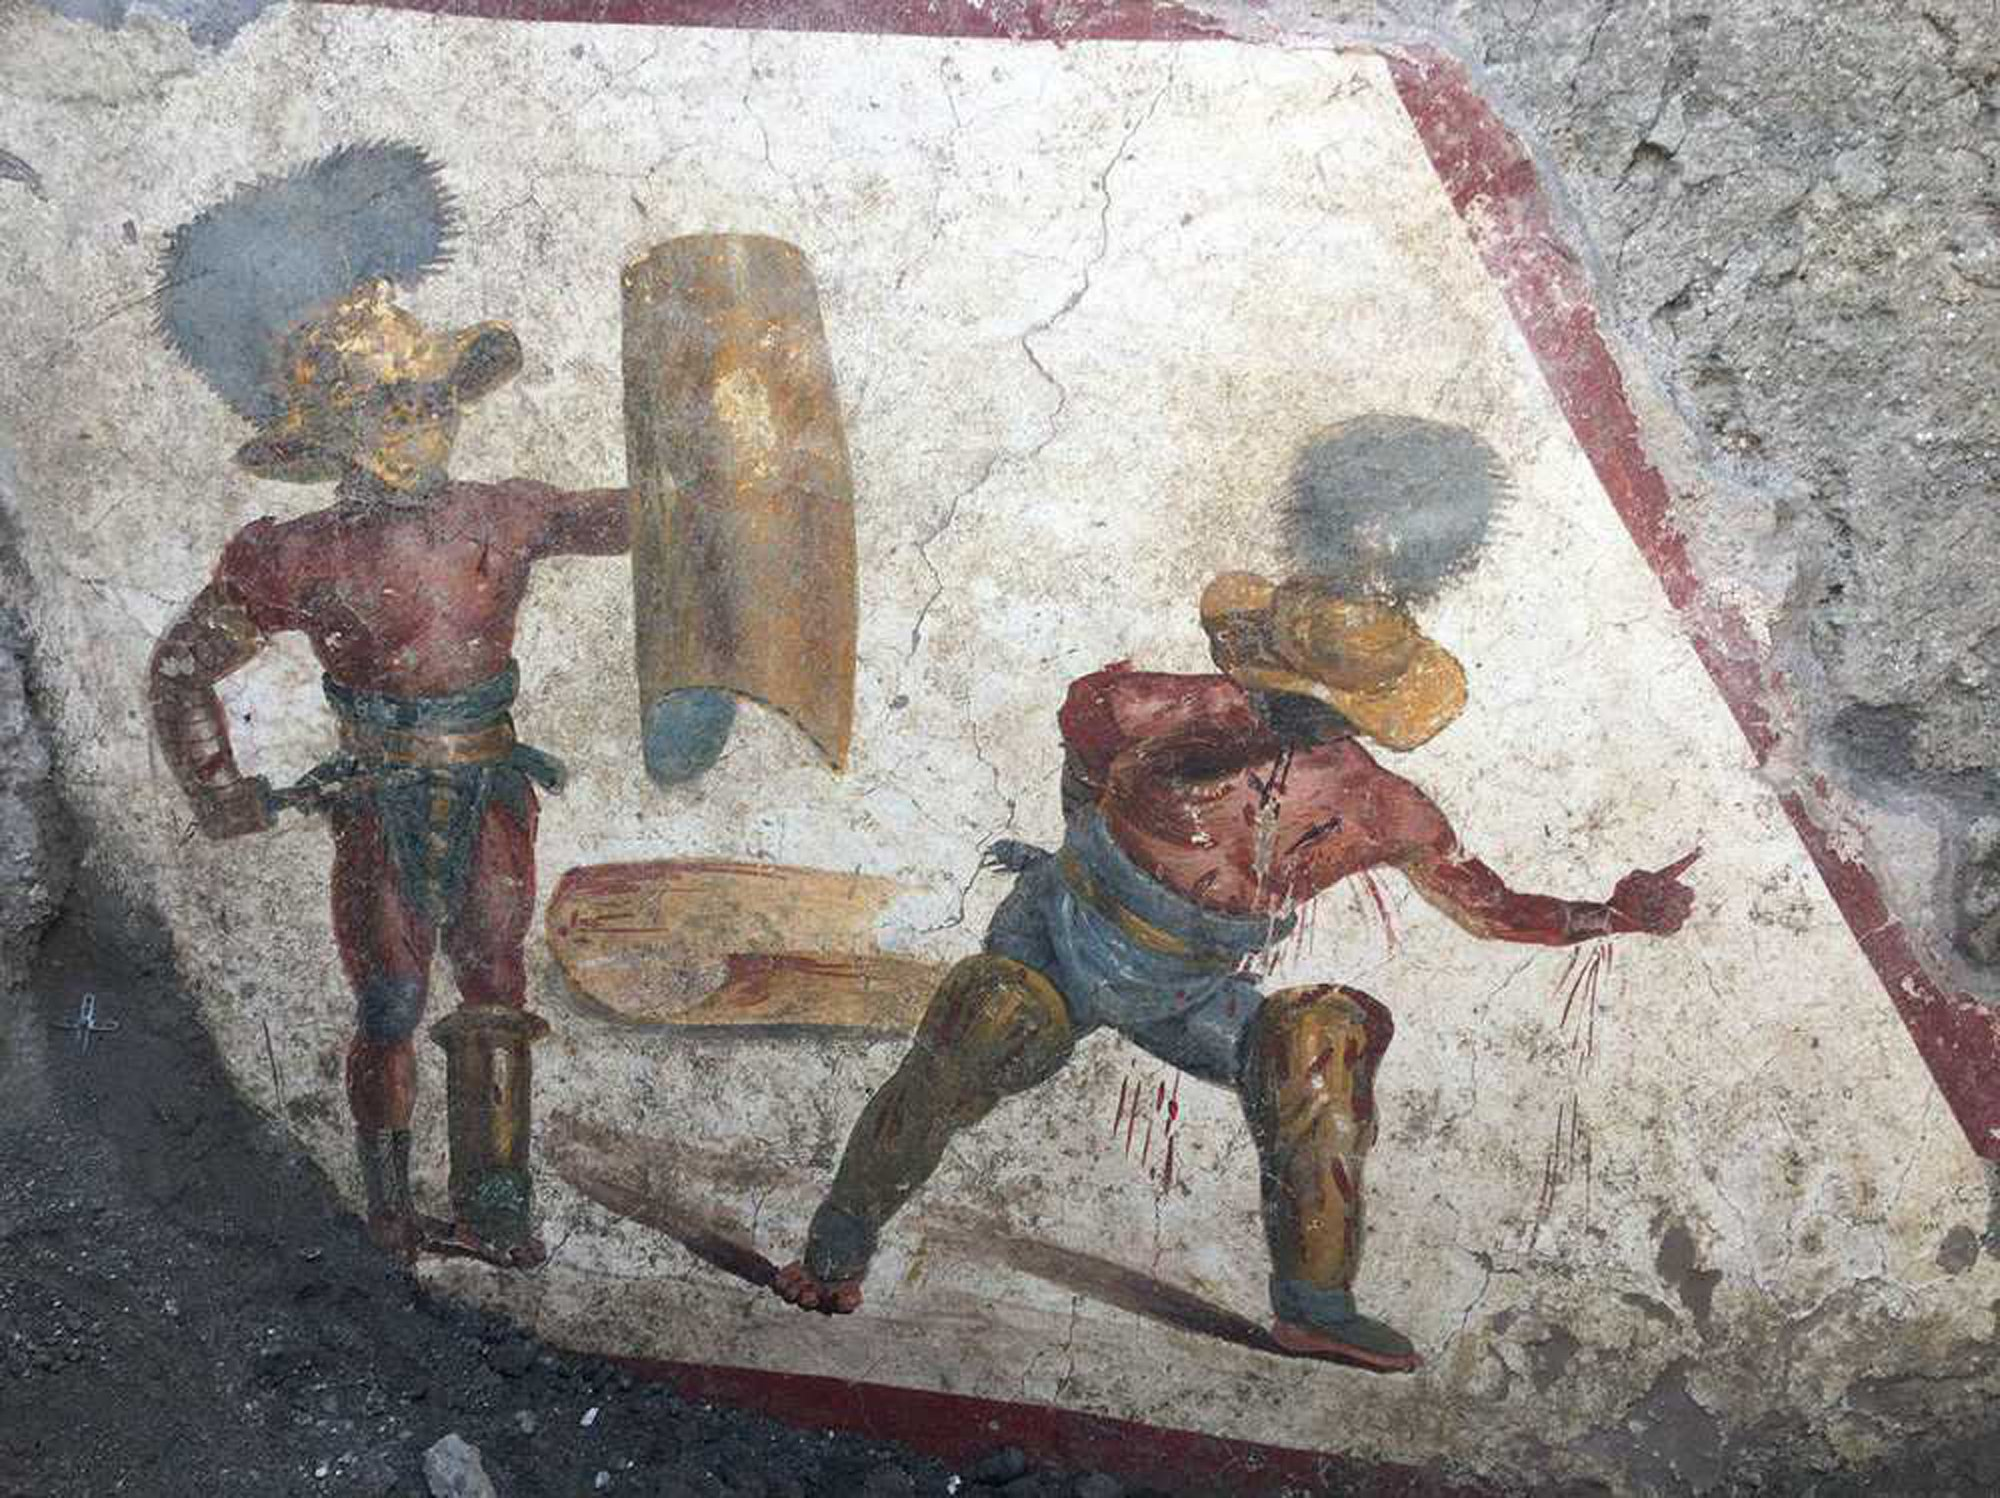 New fresco with gladiators discovered in Pompeii